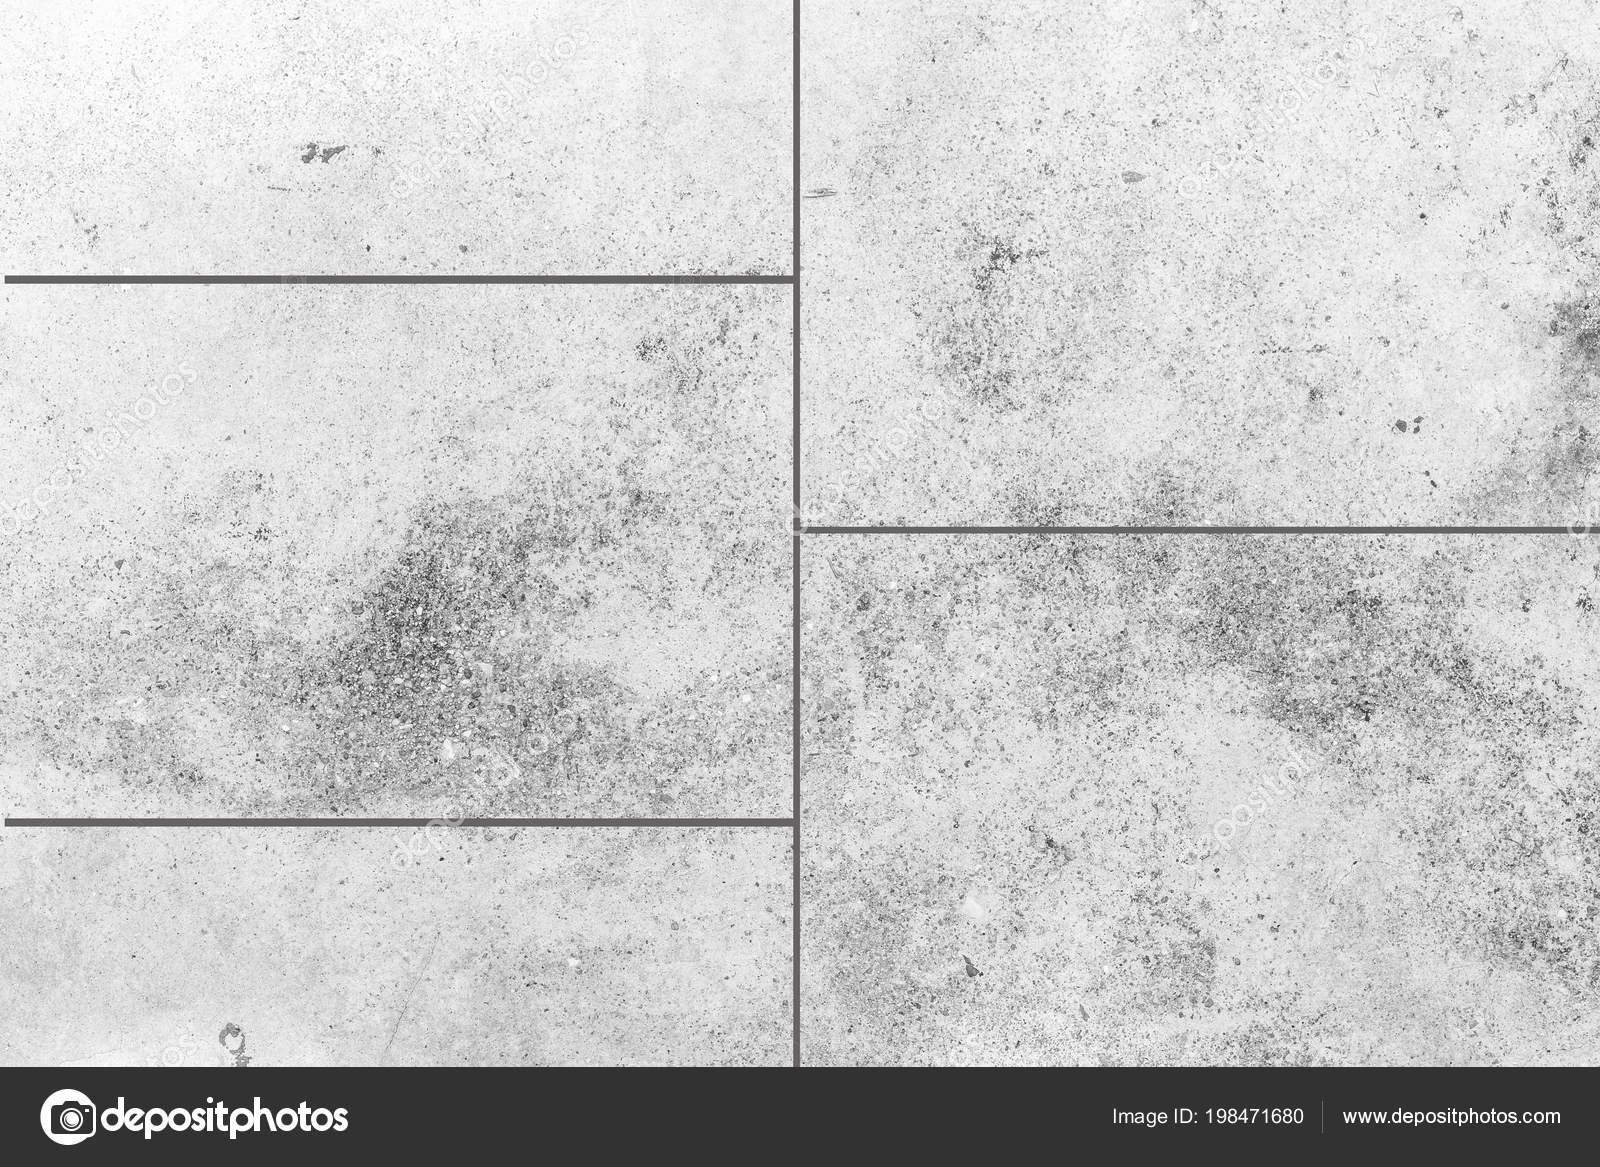 Sfondo grunge bianco grigio cemento pavimento piastrelle texture